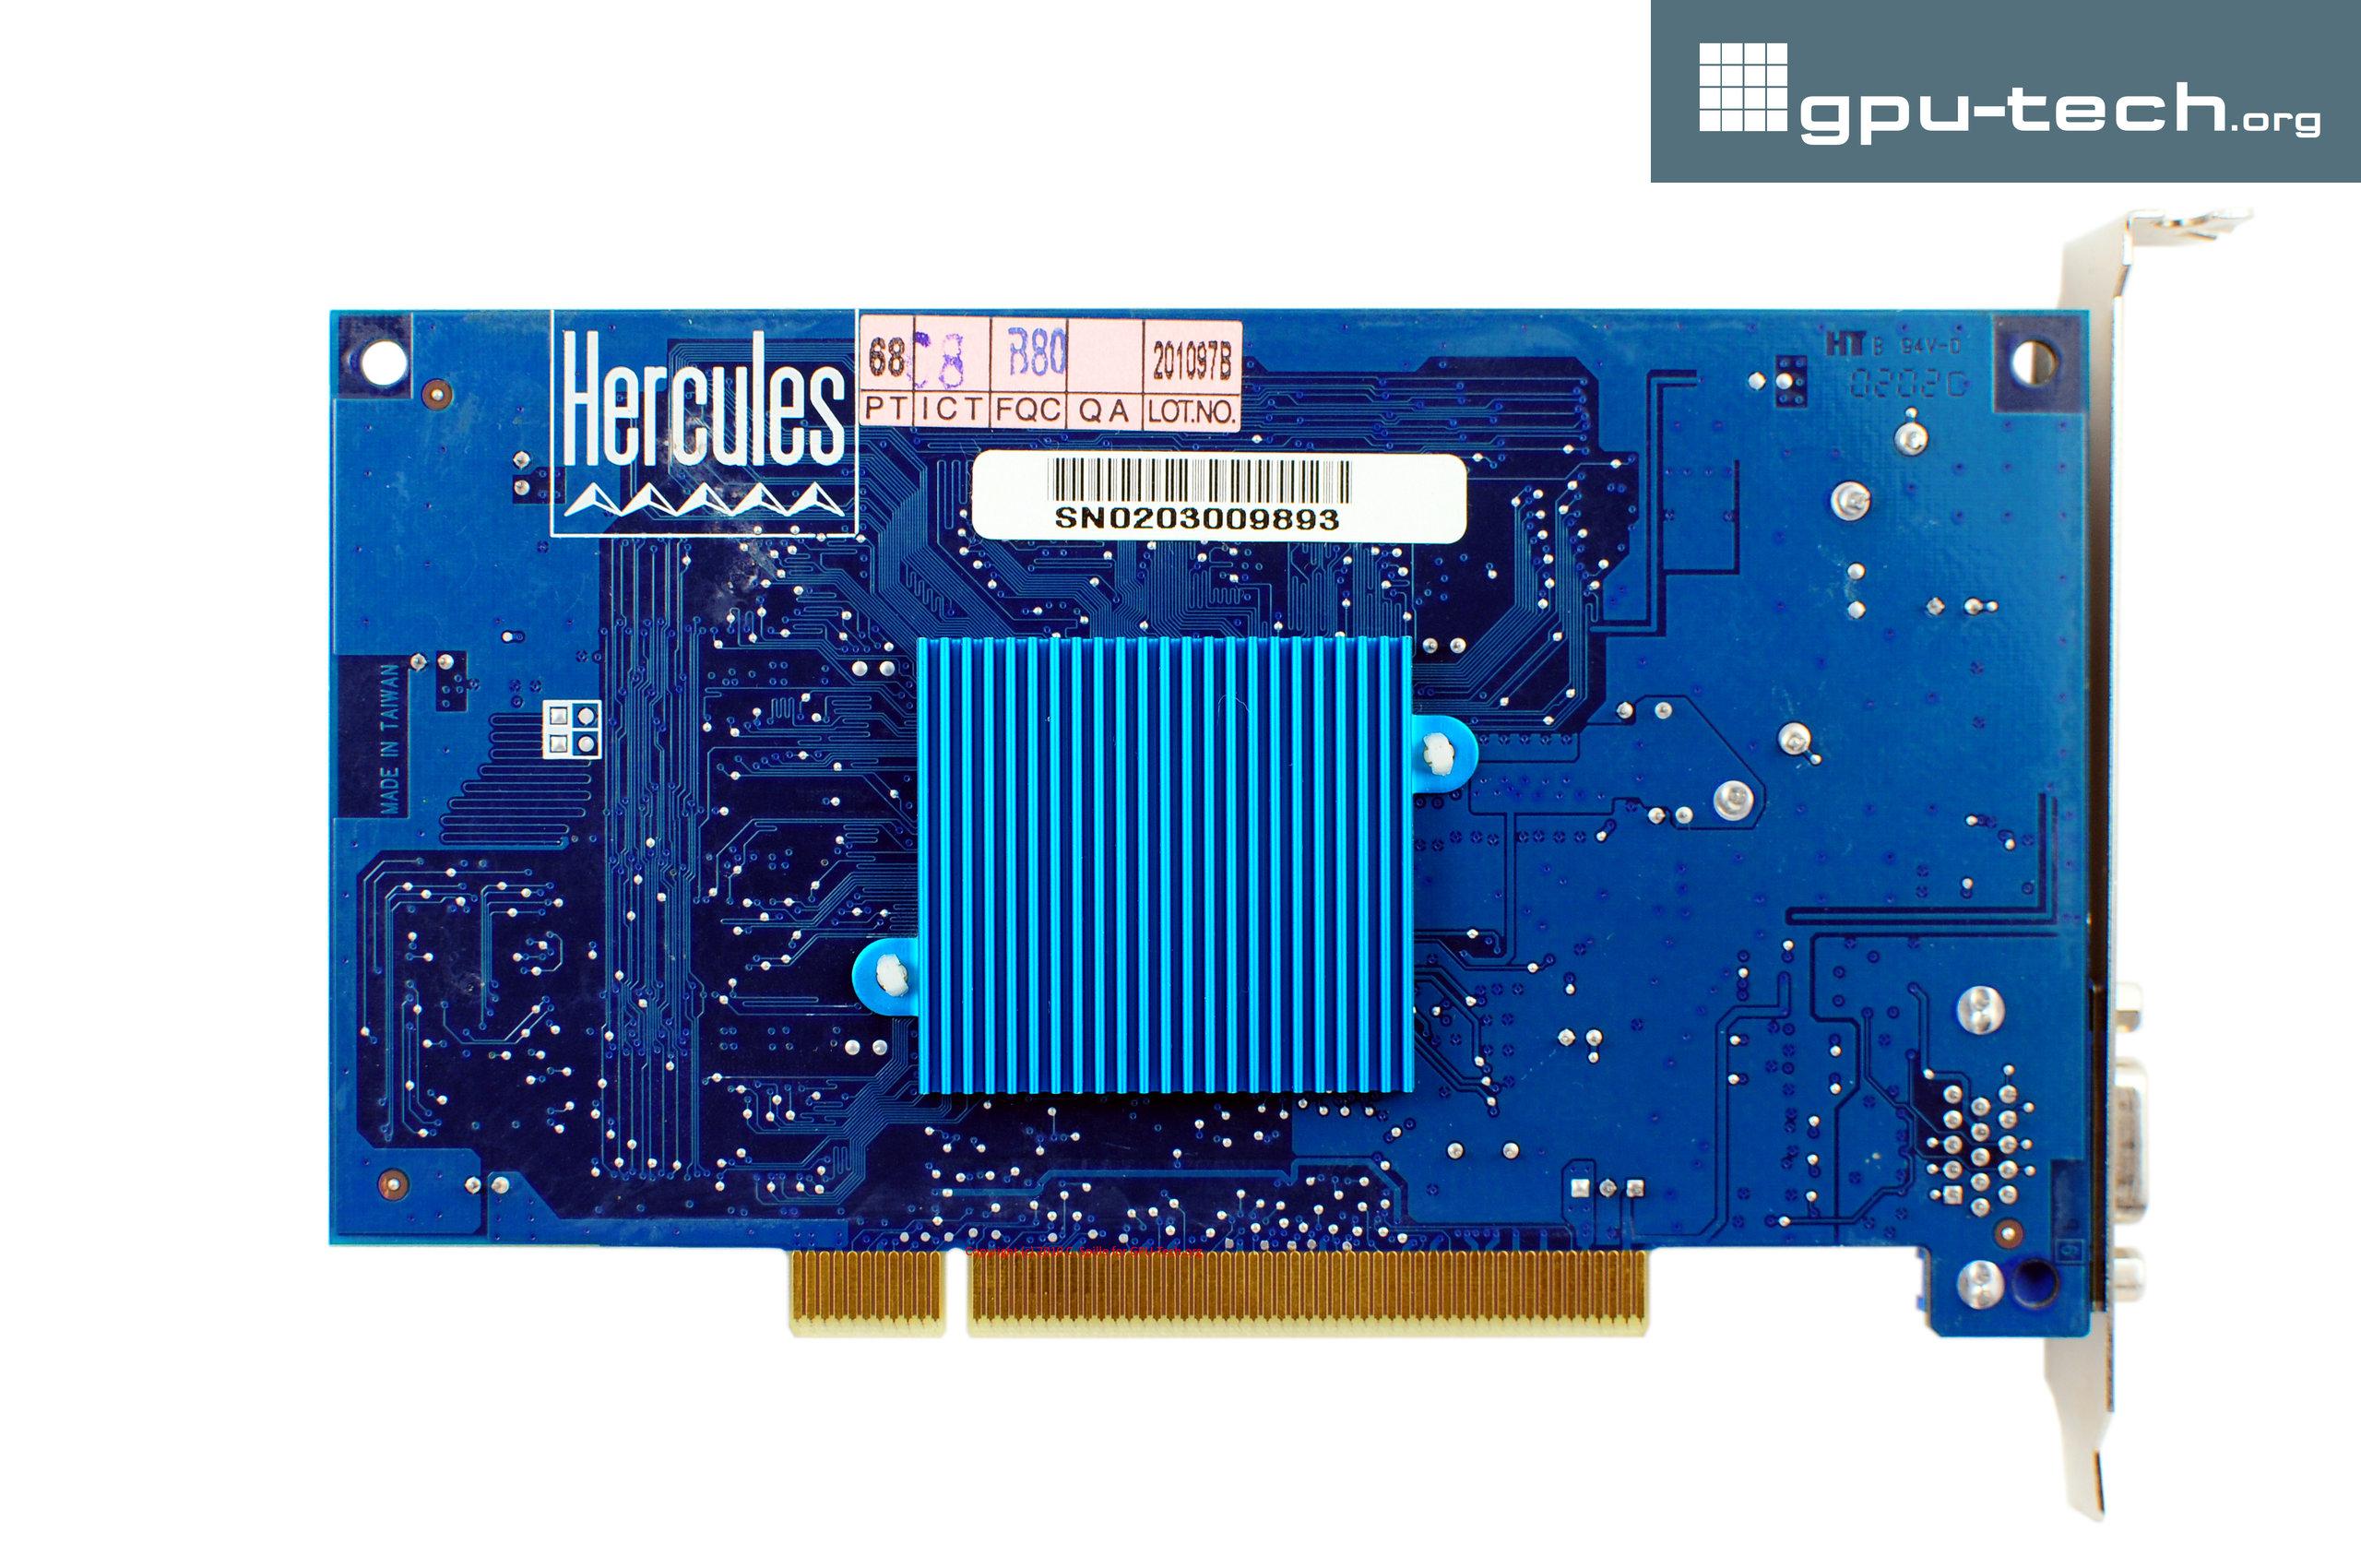 PowerVR Series 3: STG4000 Kyro on Hercules 3D Prophet 4000 XT PCI back view